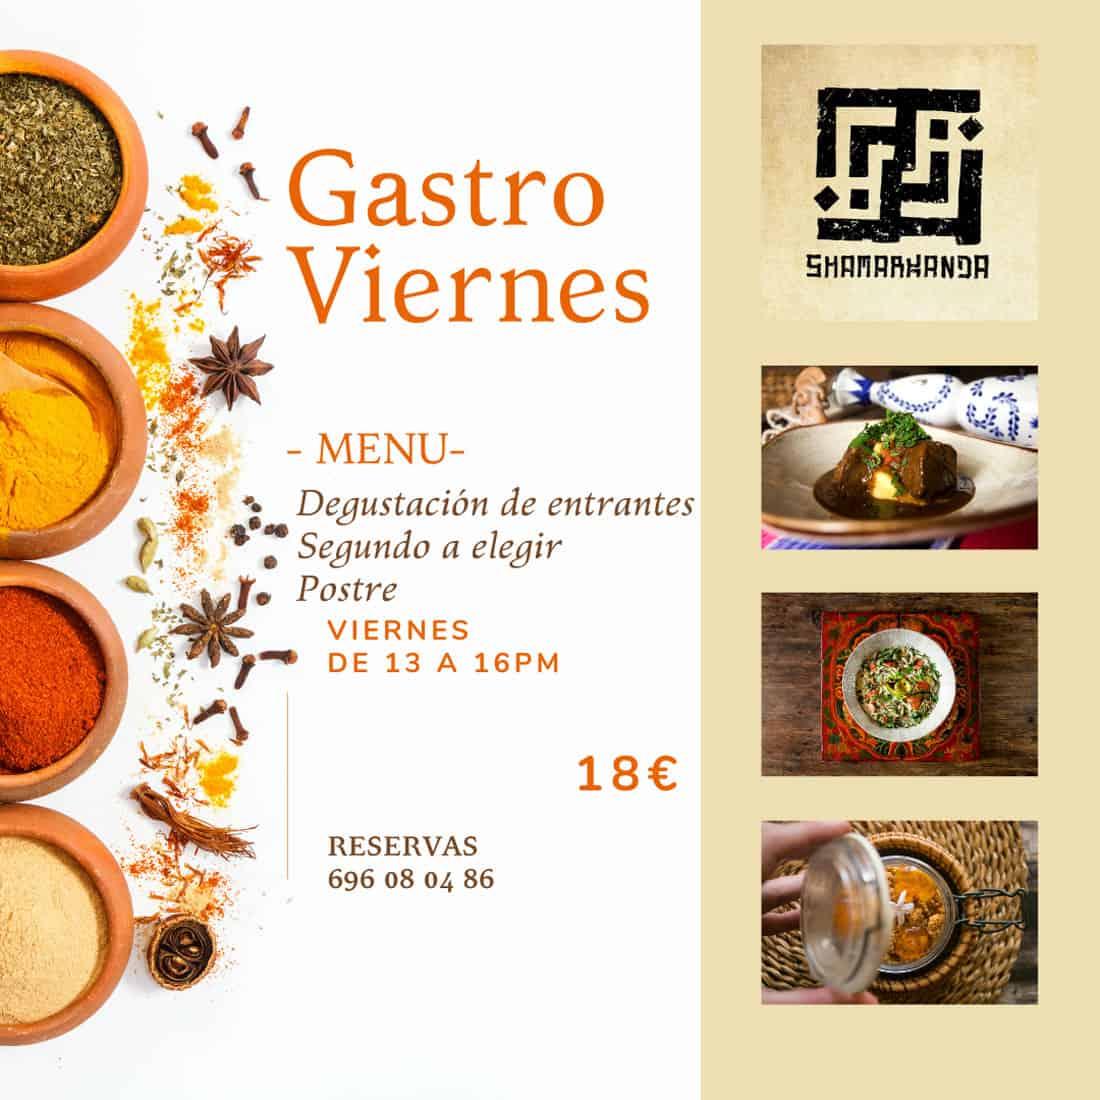 gastro-viernes-restaurante-shamarkanda-ibiza-2020-welcometoibiza